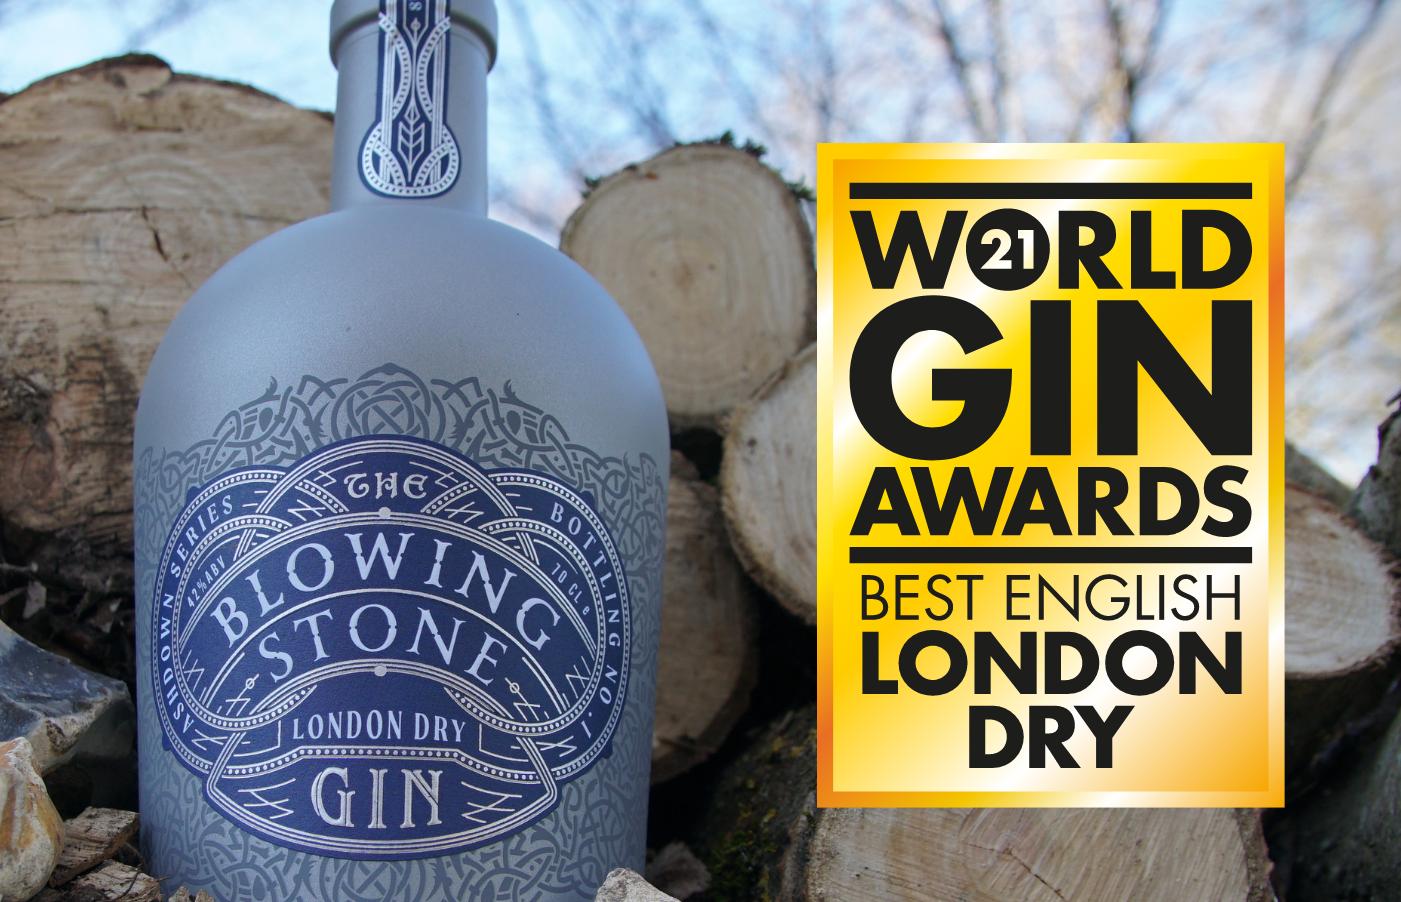 Winners of Best English London Dry